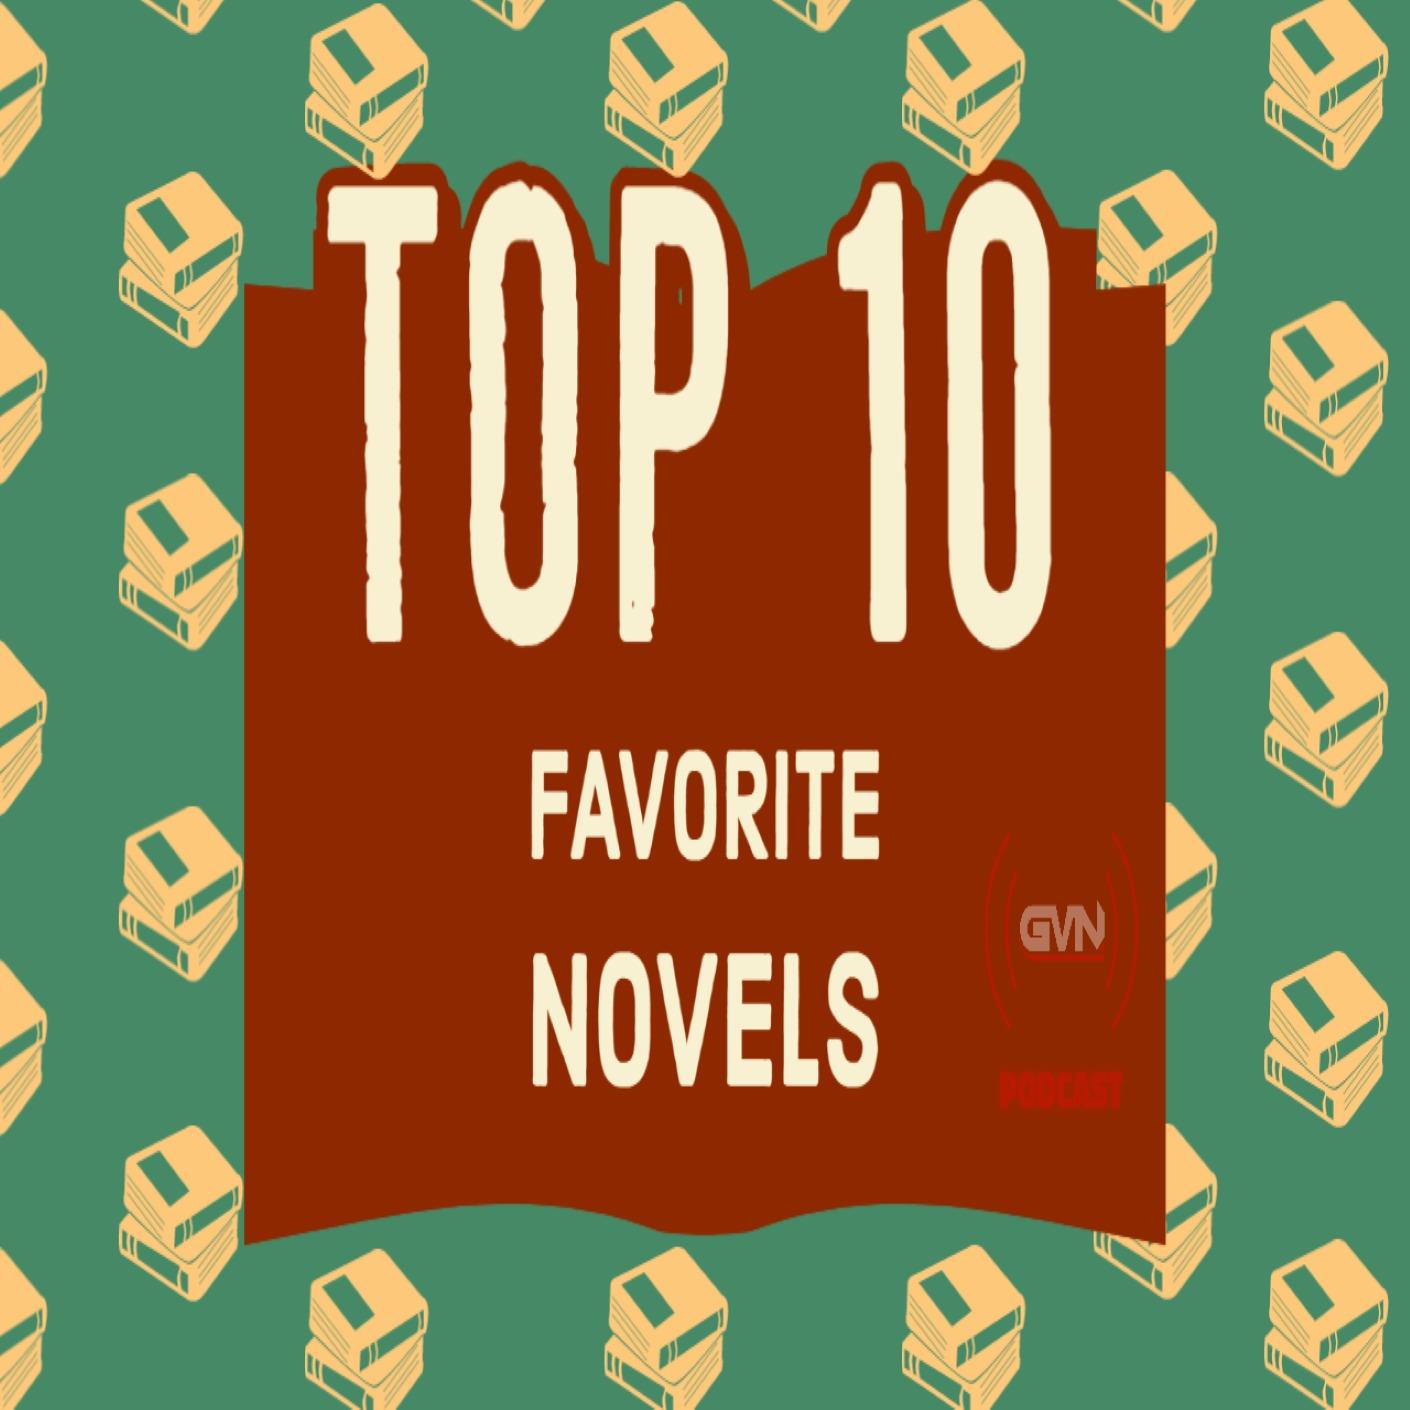 Top 10 Favorite Novels